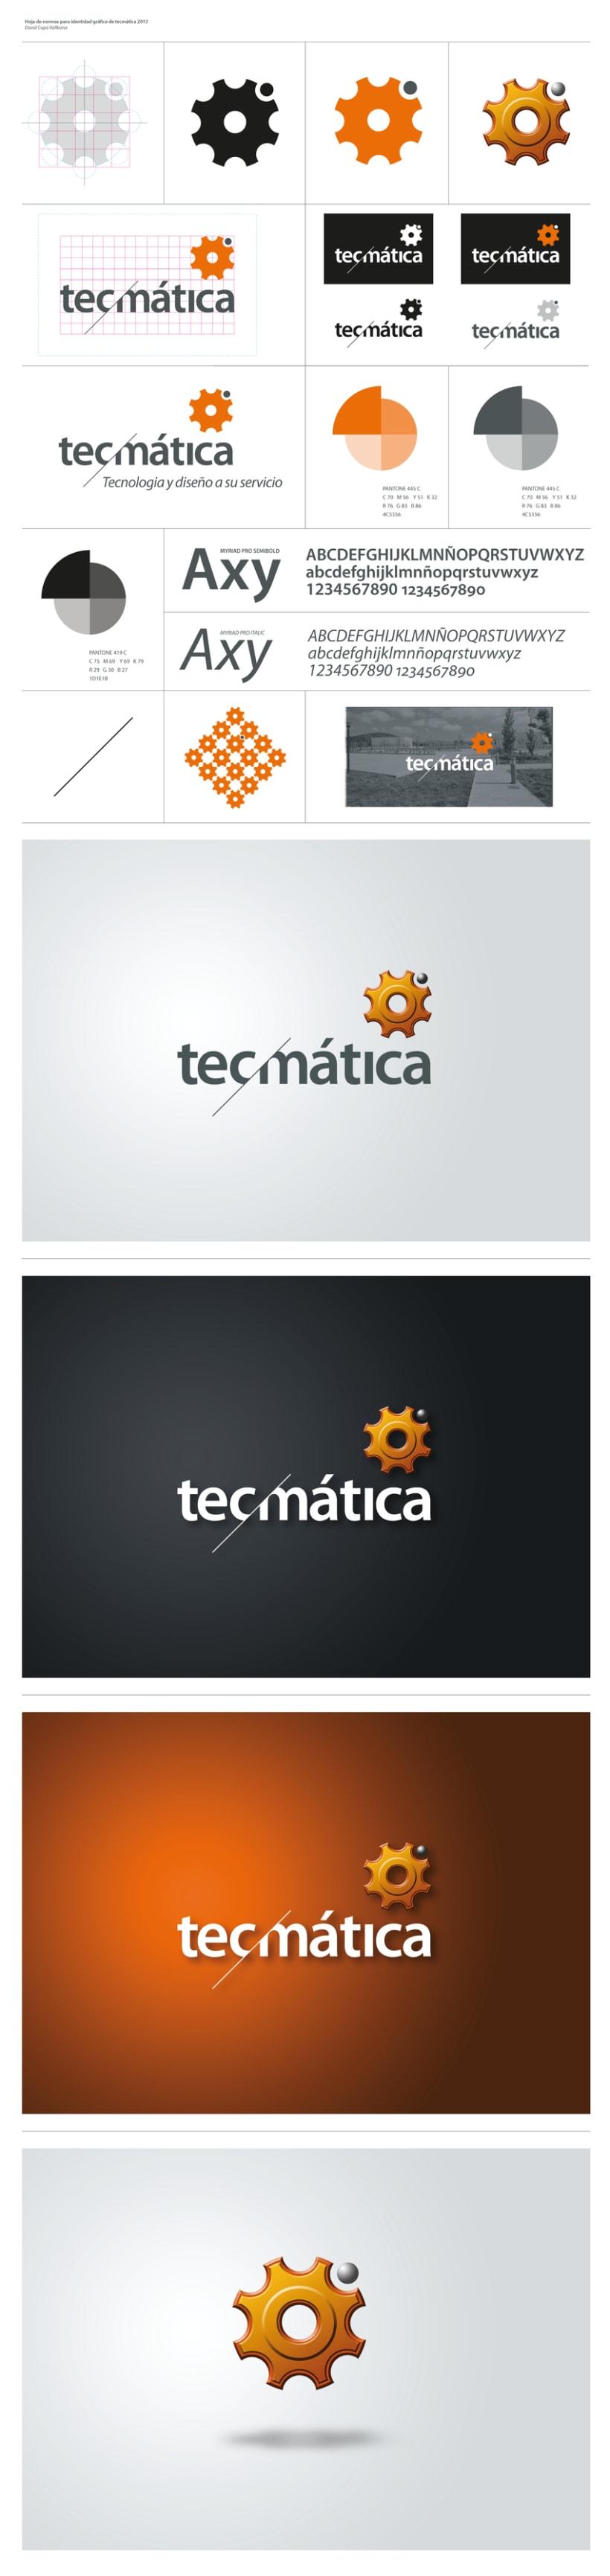 Tecmática 2013 5